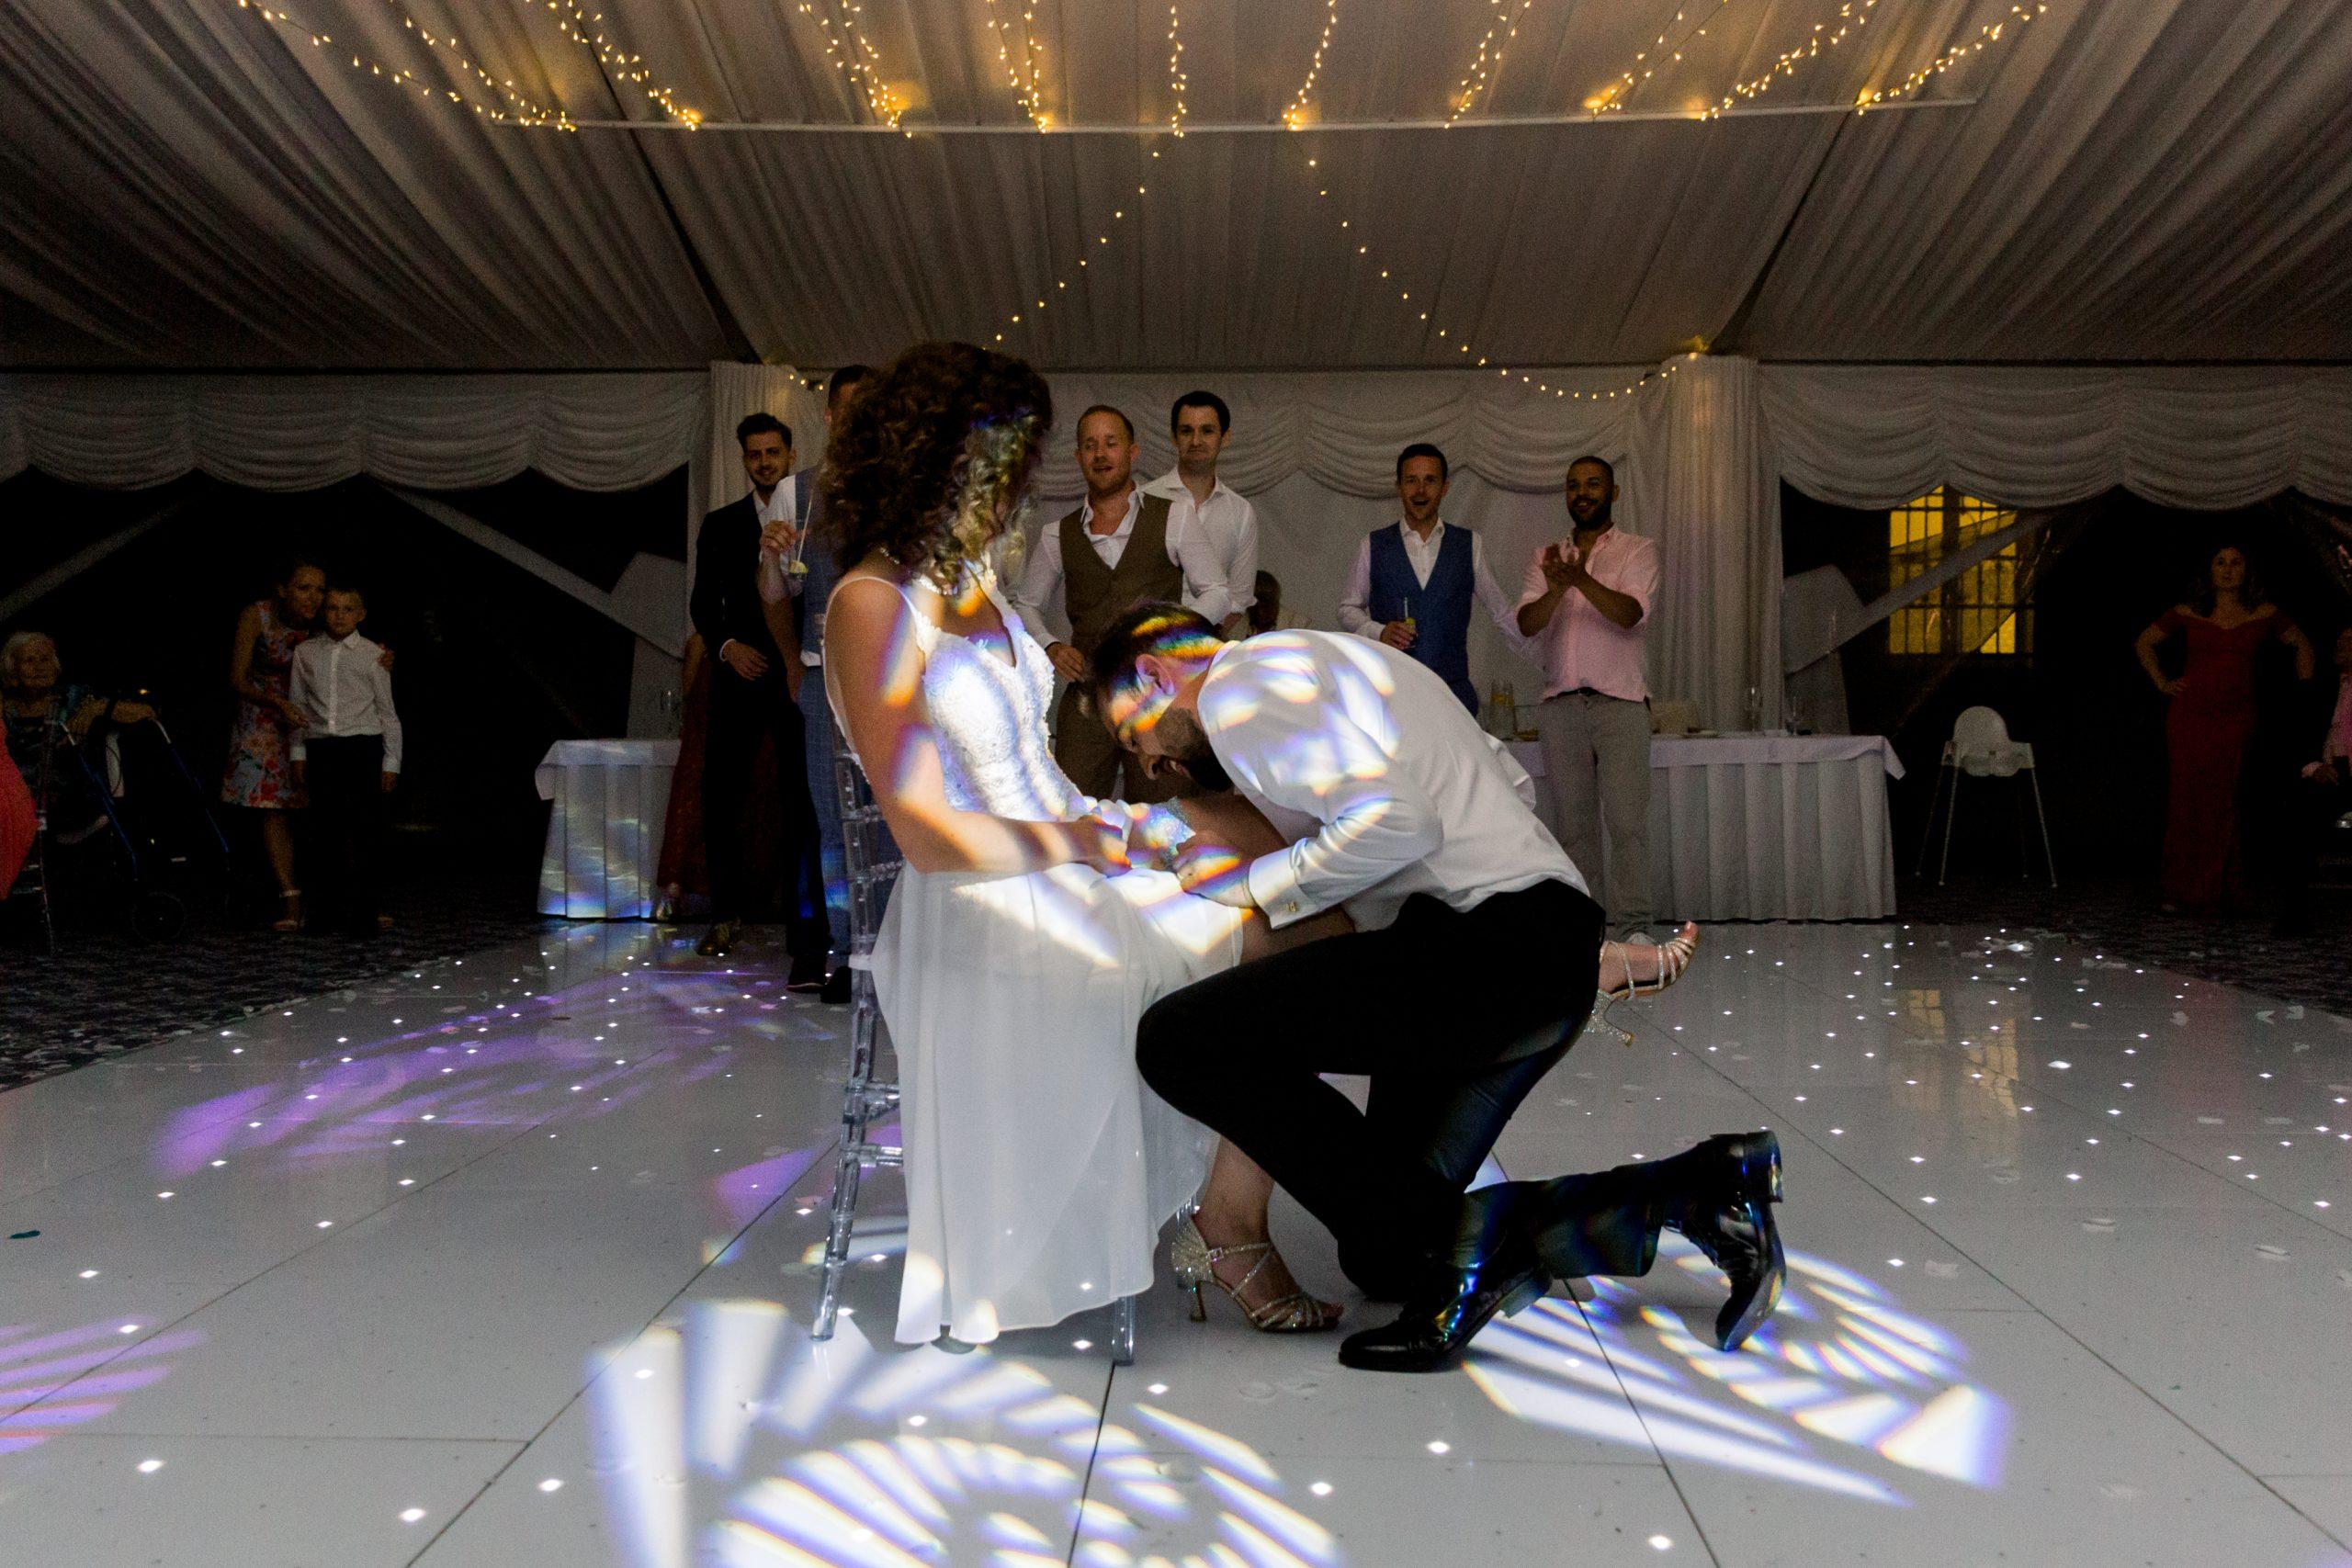 Svadba Art Hotel Kaštiel, Tomášov 03 #svadobnyDJ, #djanasvadbu, #svadba, #svadbatomasov, #DJAnavi